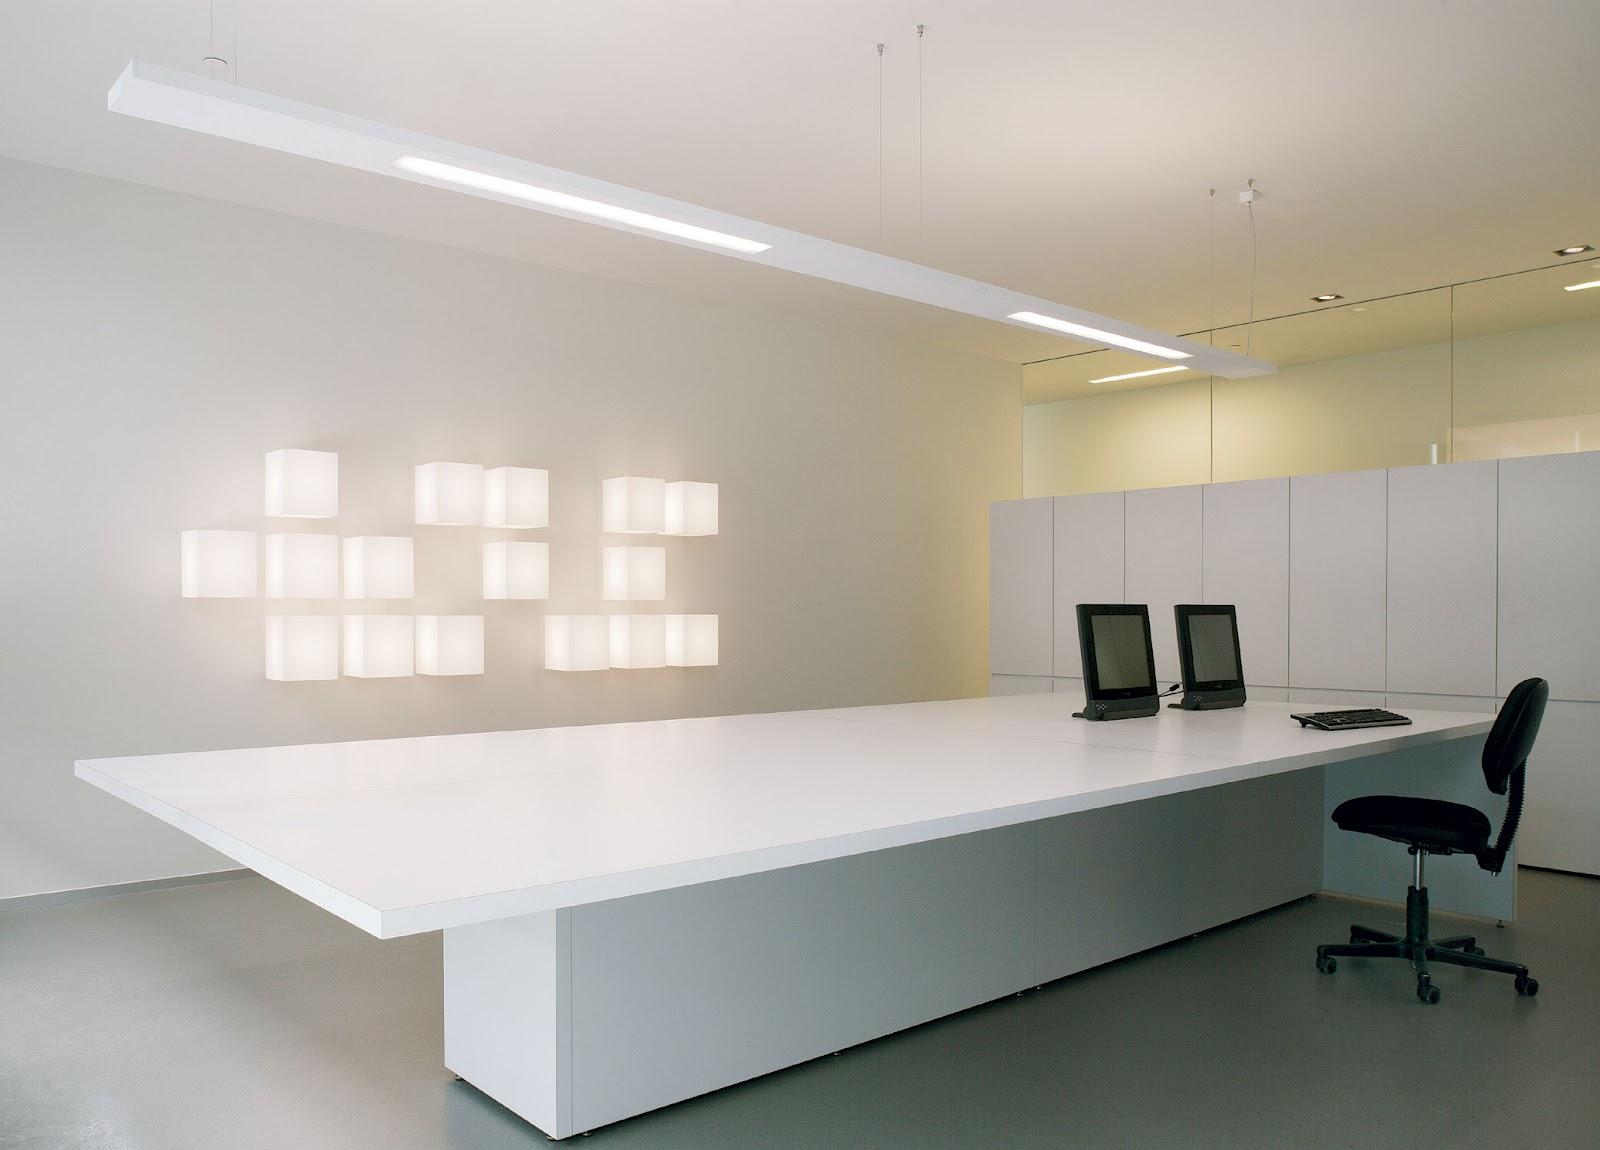 Iluminaci n interior panama lighting - Proyectos de iluminacion interior ...